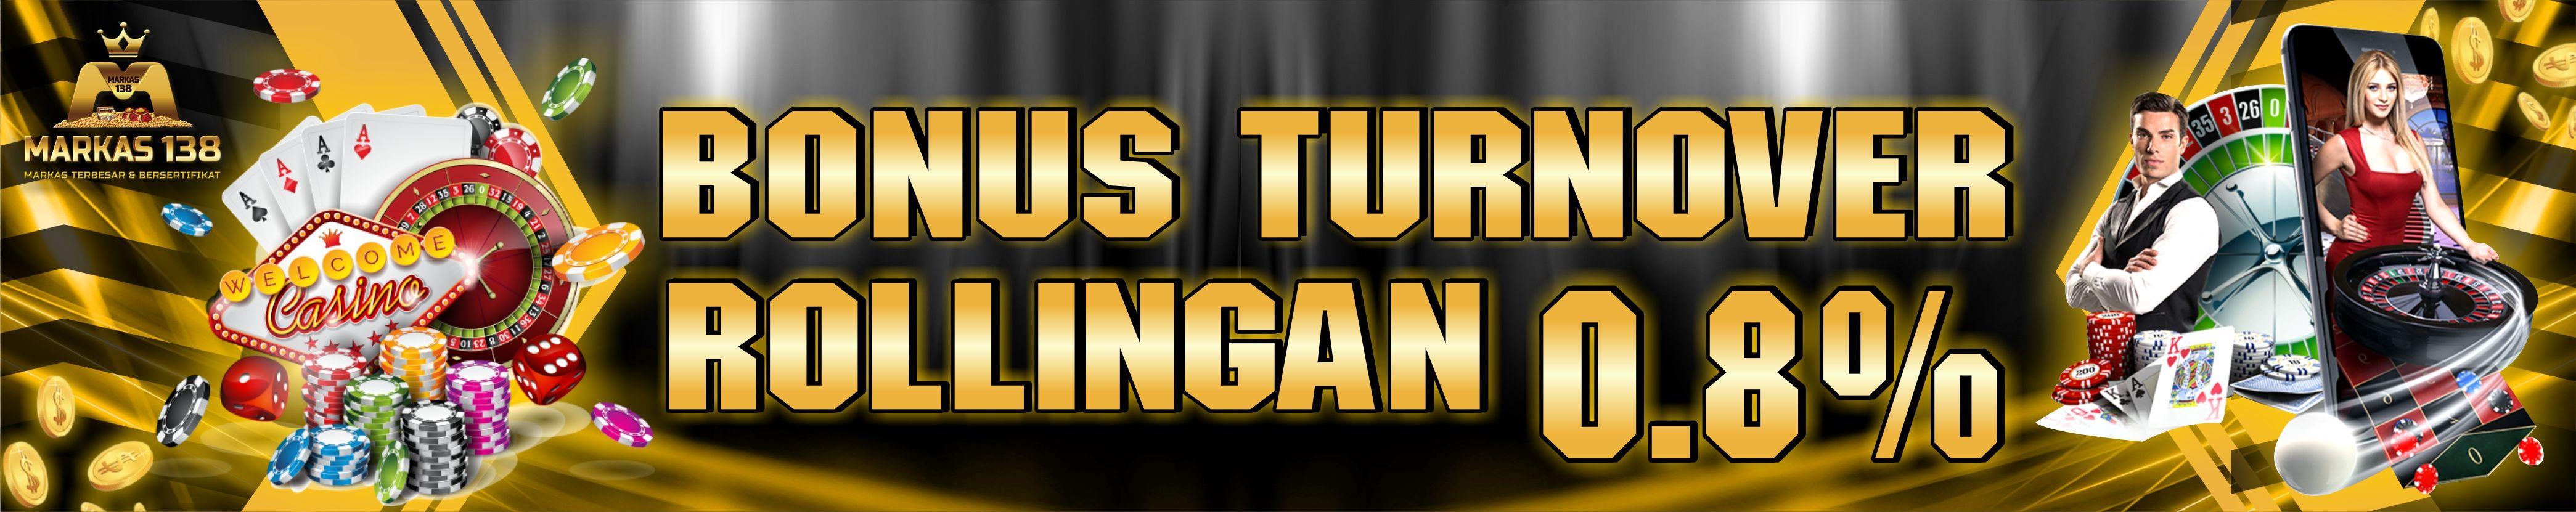 Bonus Turnover / Rollingan (Slot & Casino⟩ 0.8%